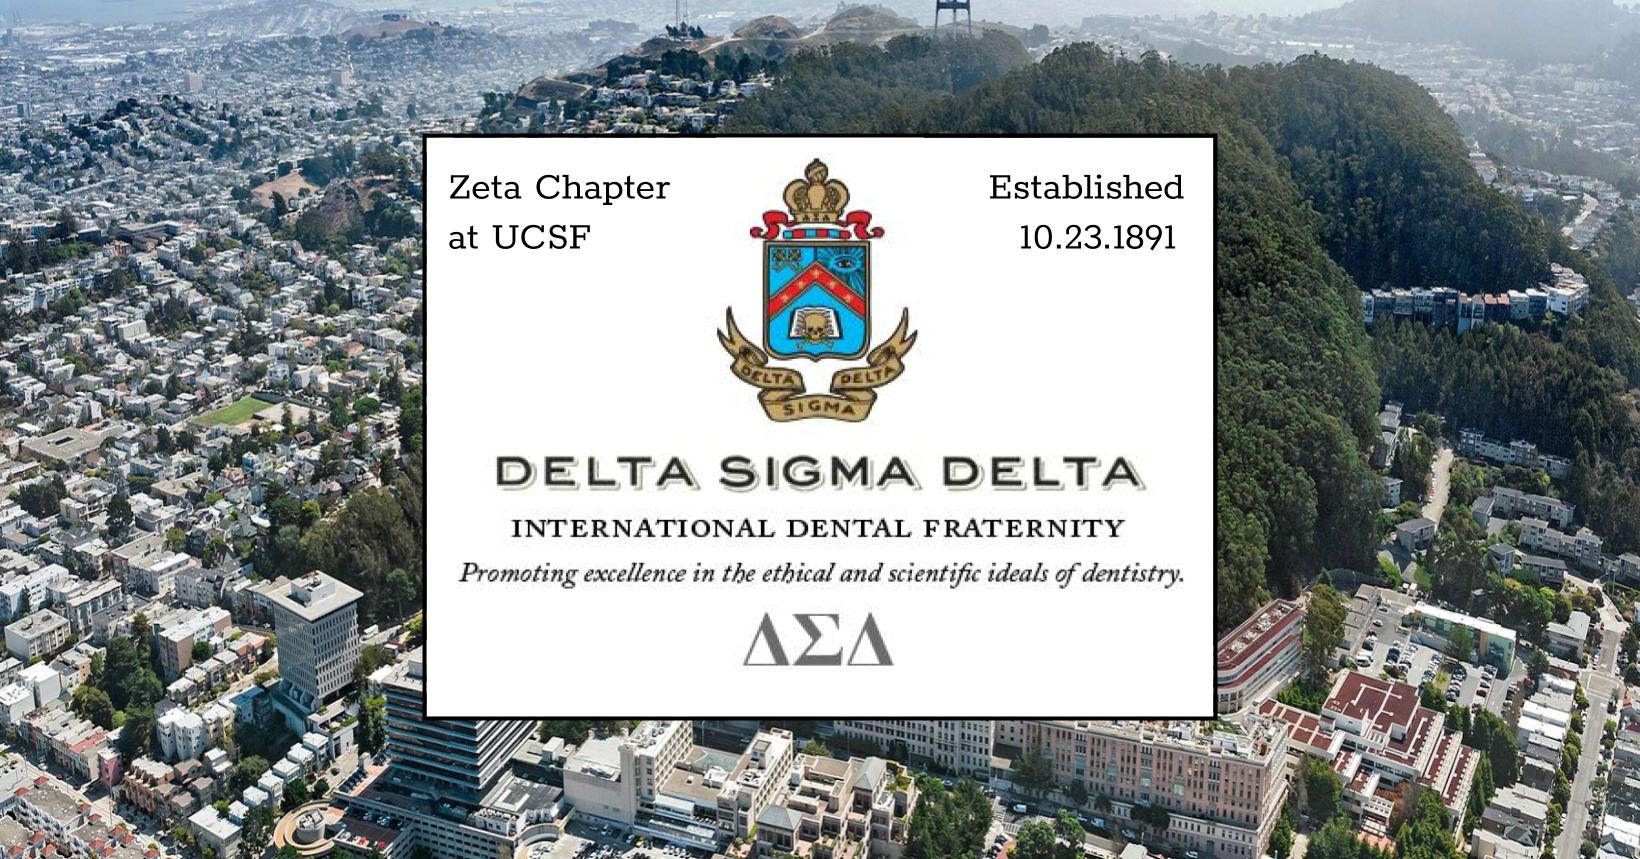 Members | DSD - Zeta (UCSF)